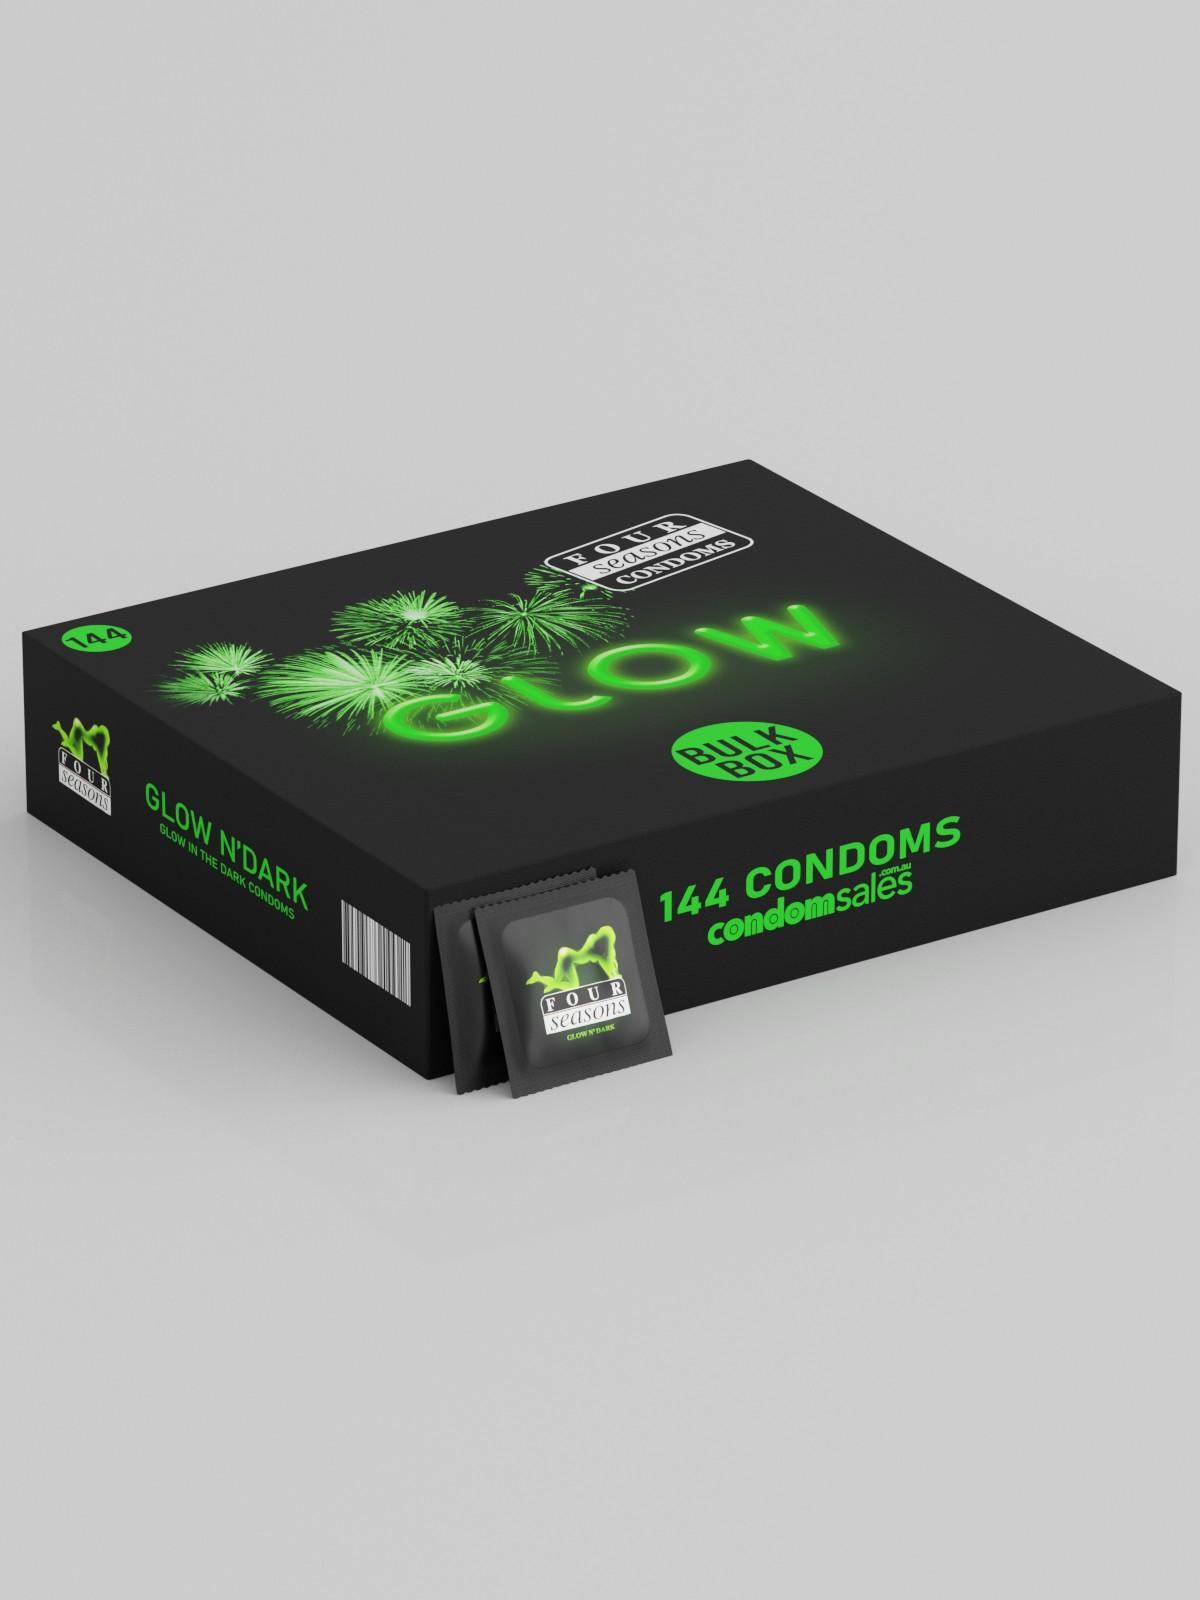 Four Seasons Glow N' Dark Condoms (144 Bulk) - Buy Bulk Condoms Online